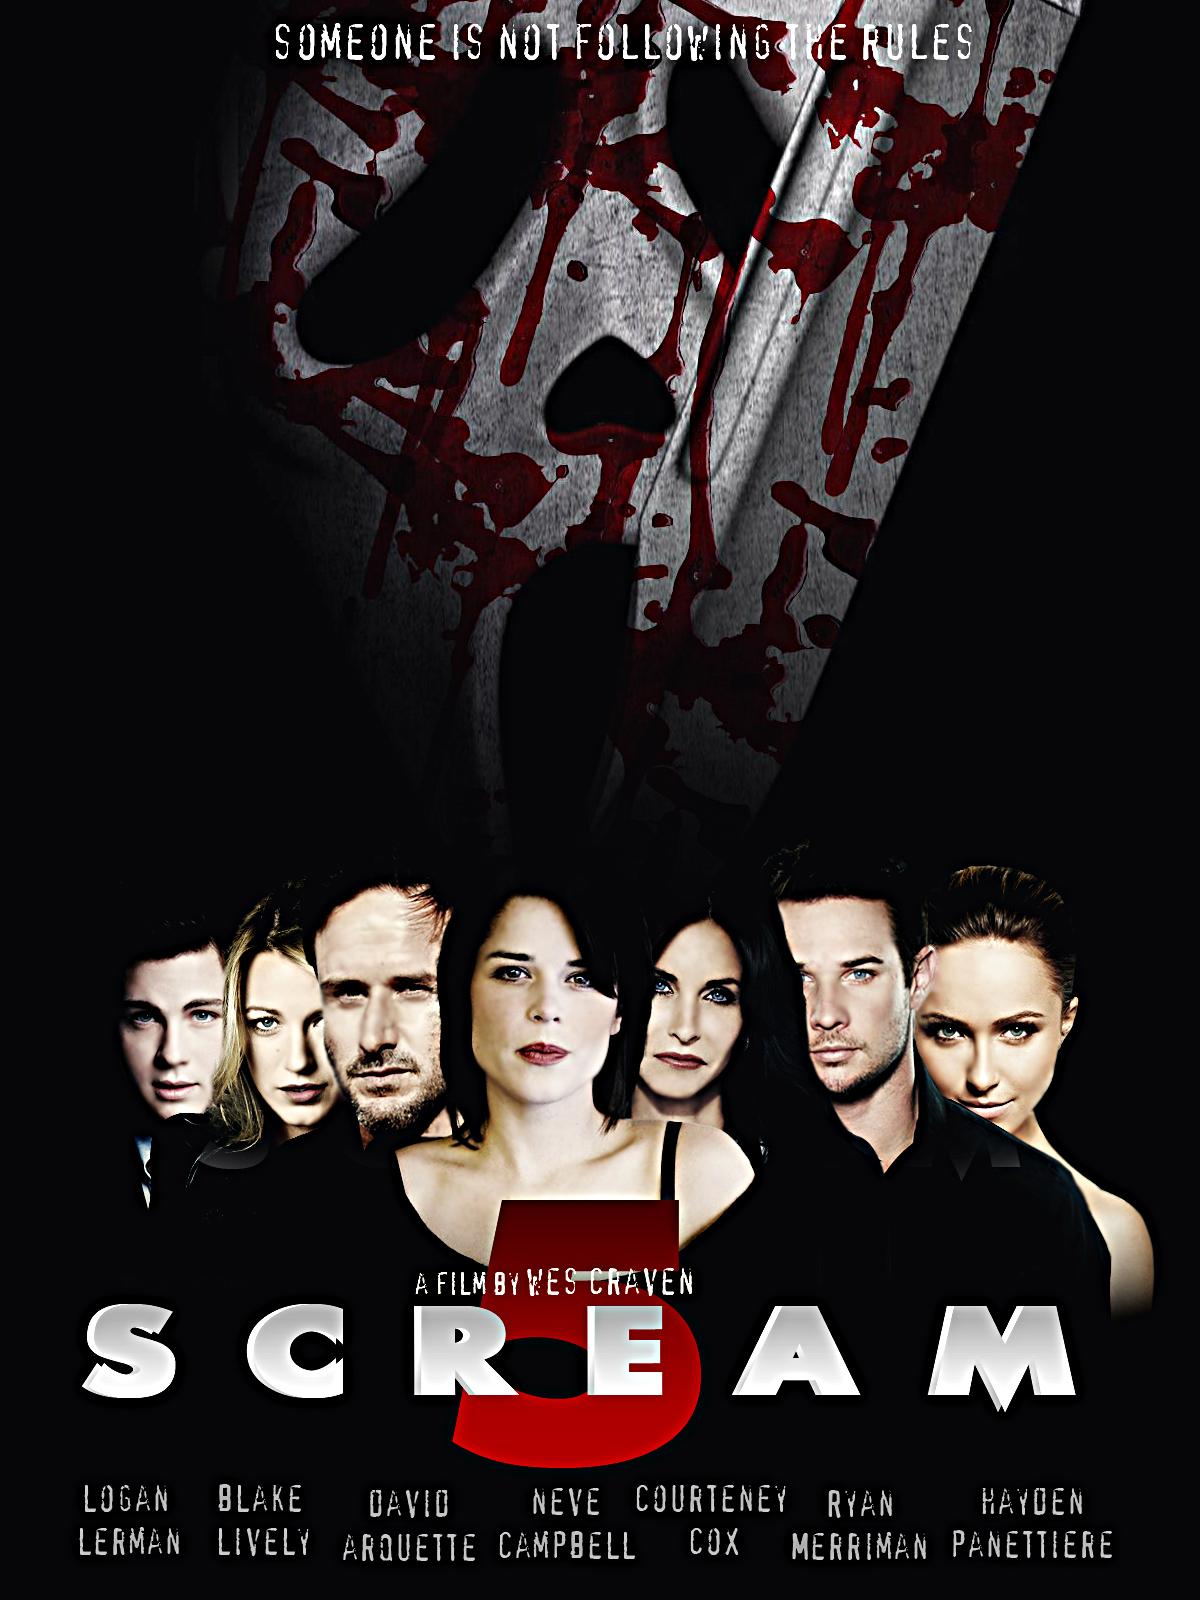 Scream 5 characters